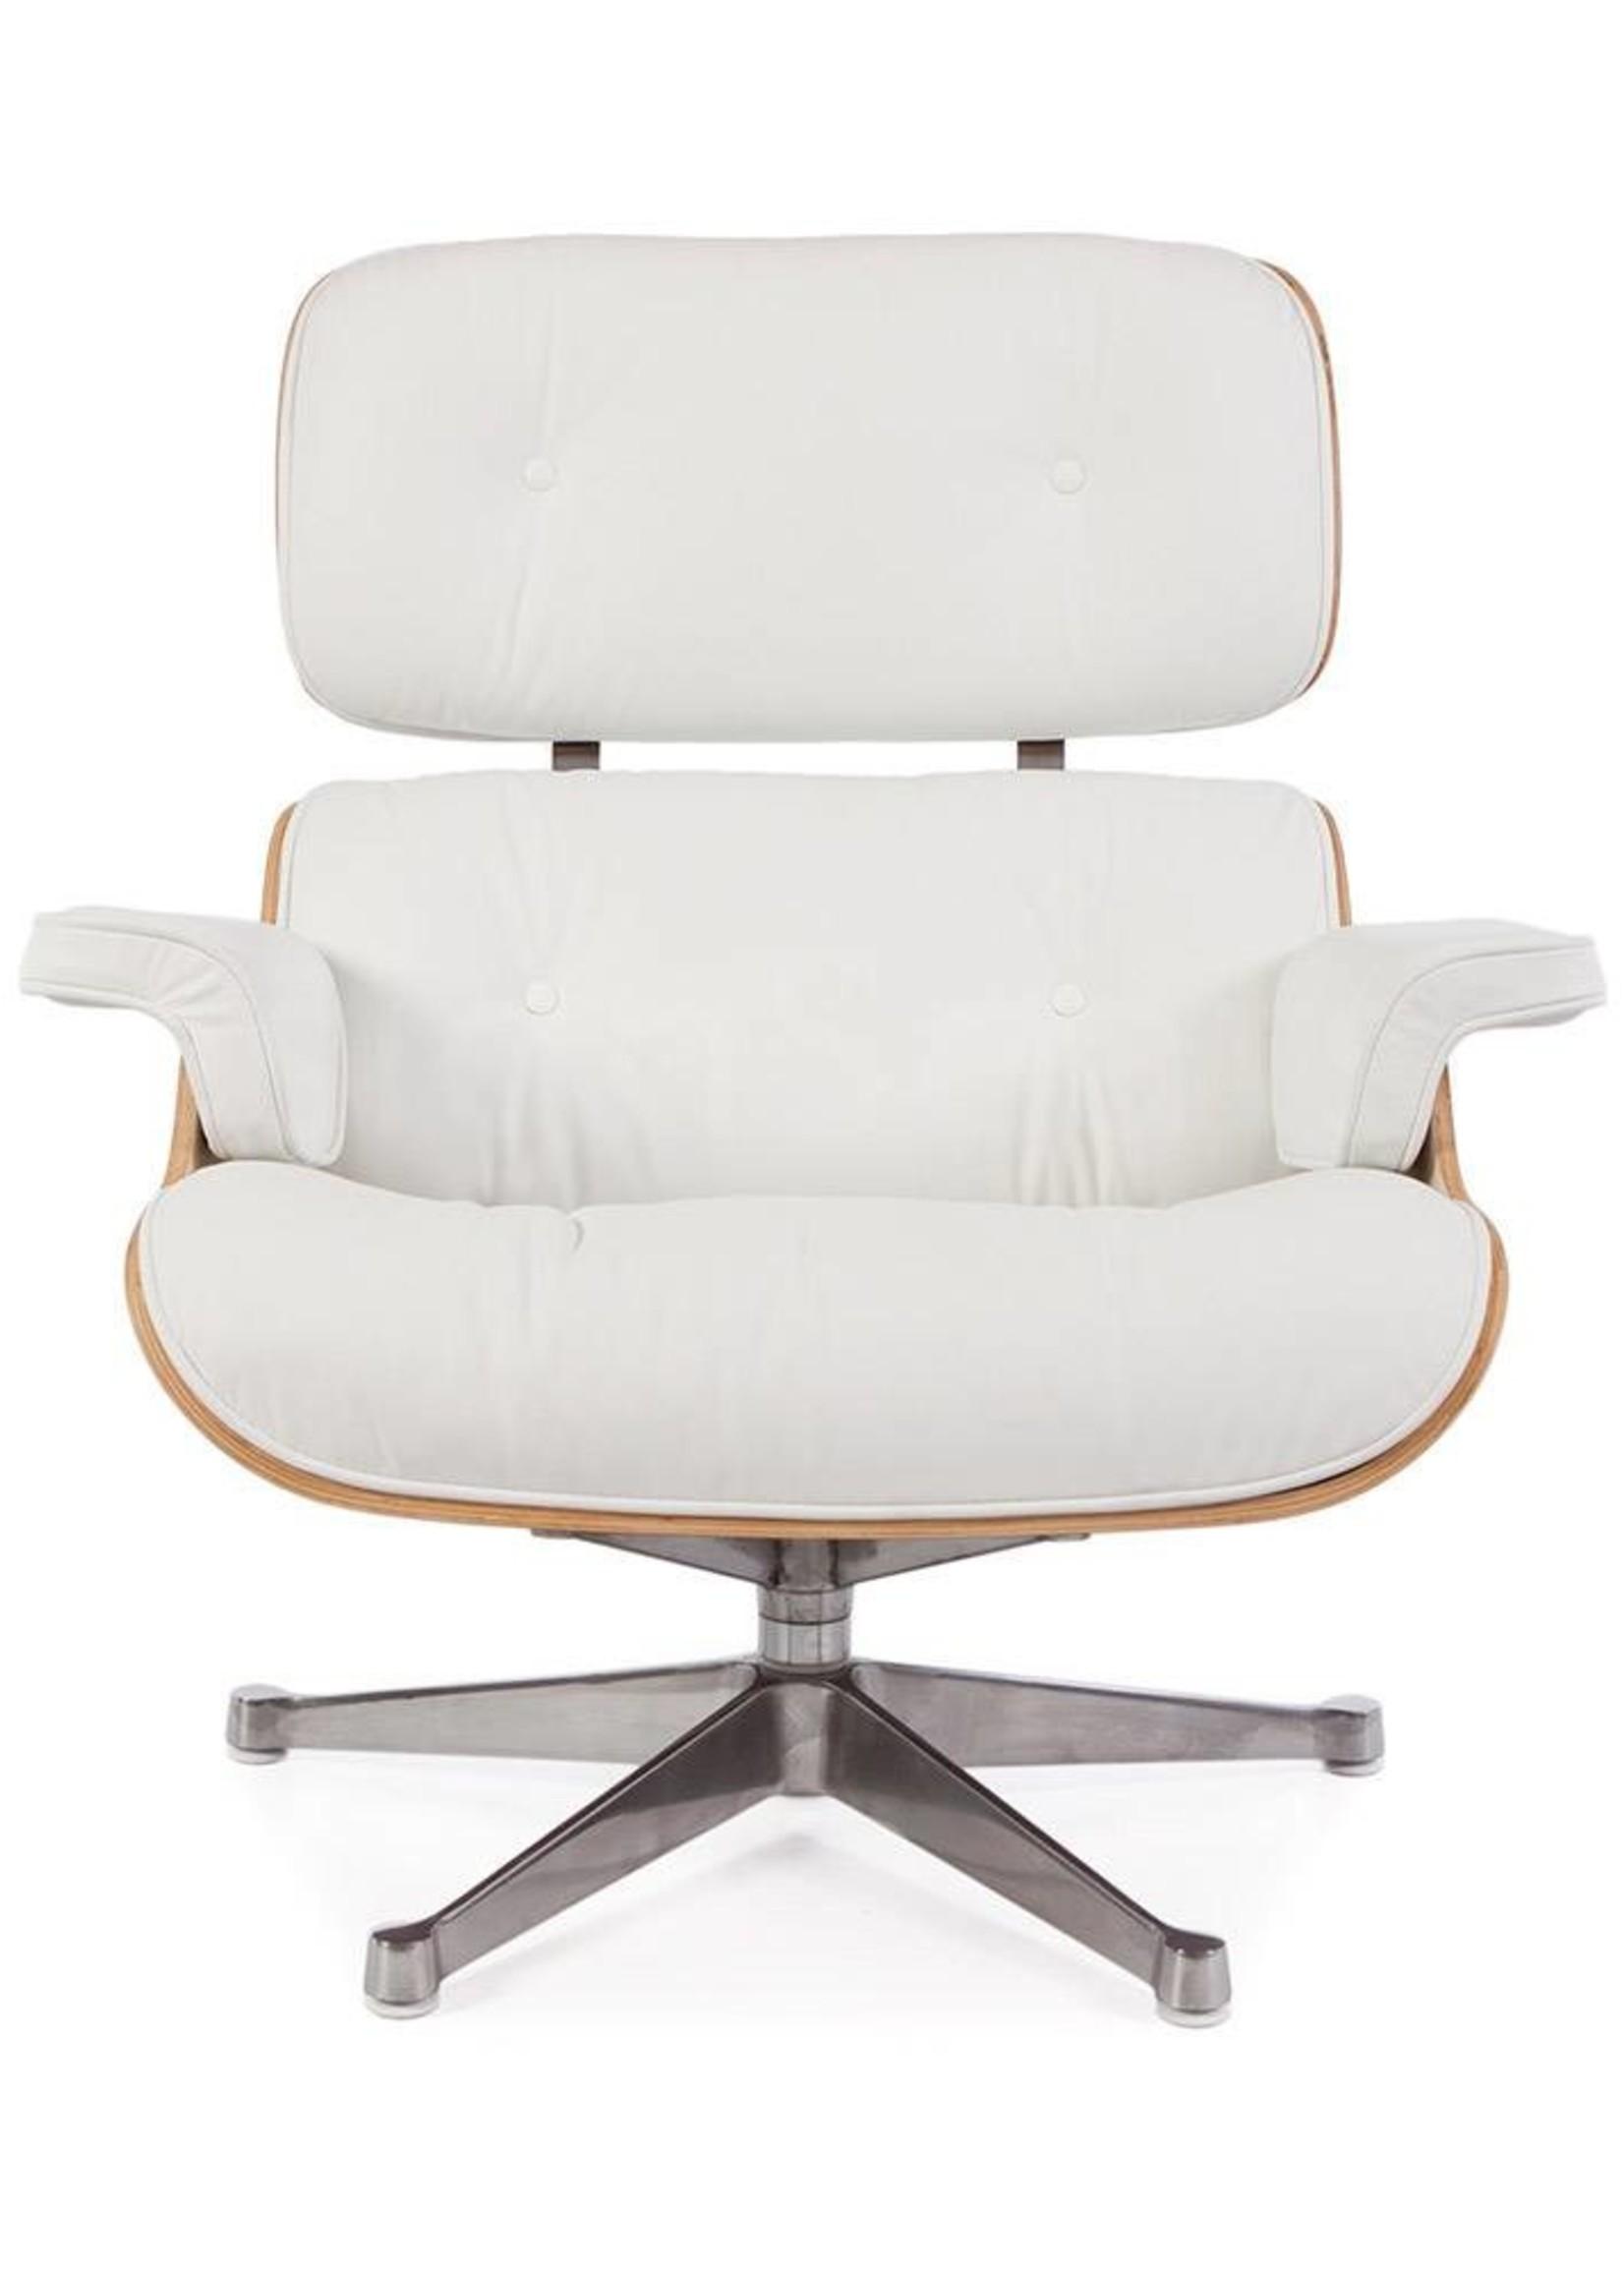 Eames Lounge Chair Walnut White